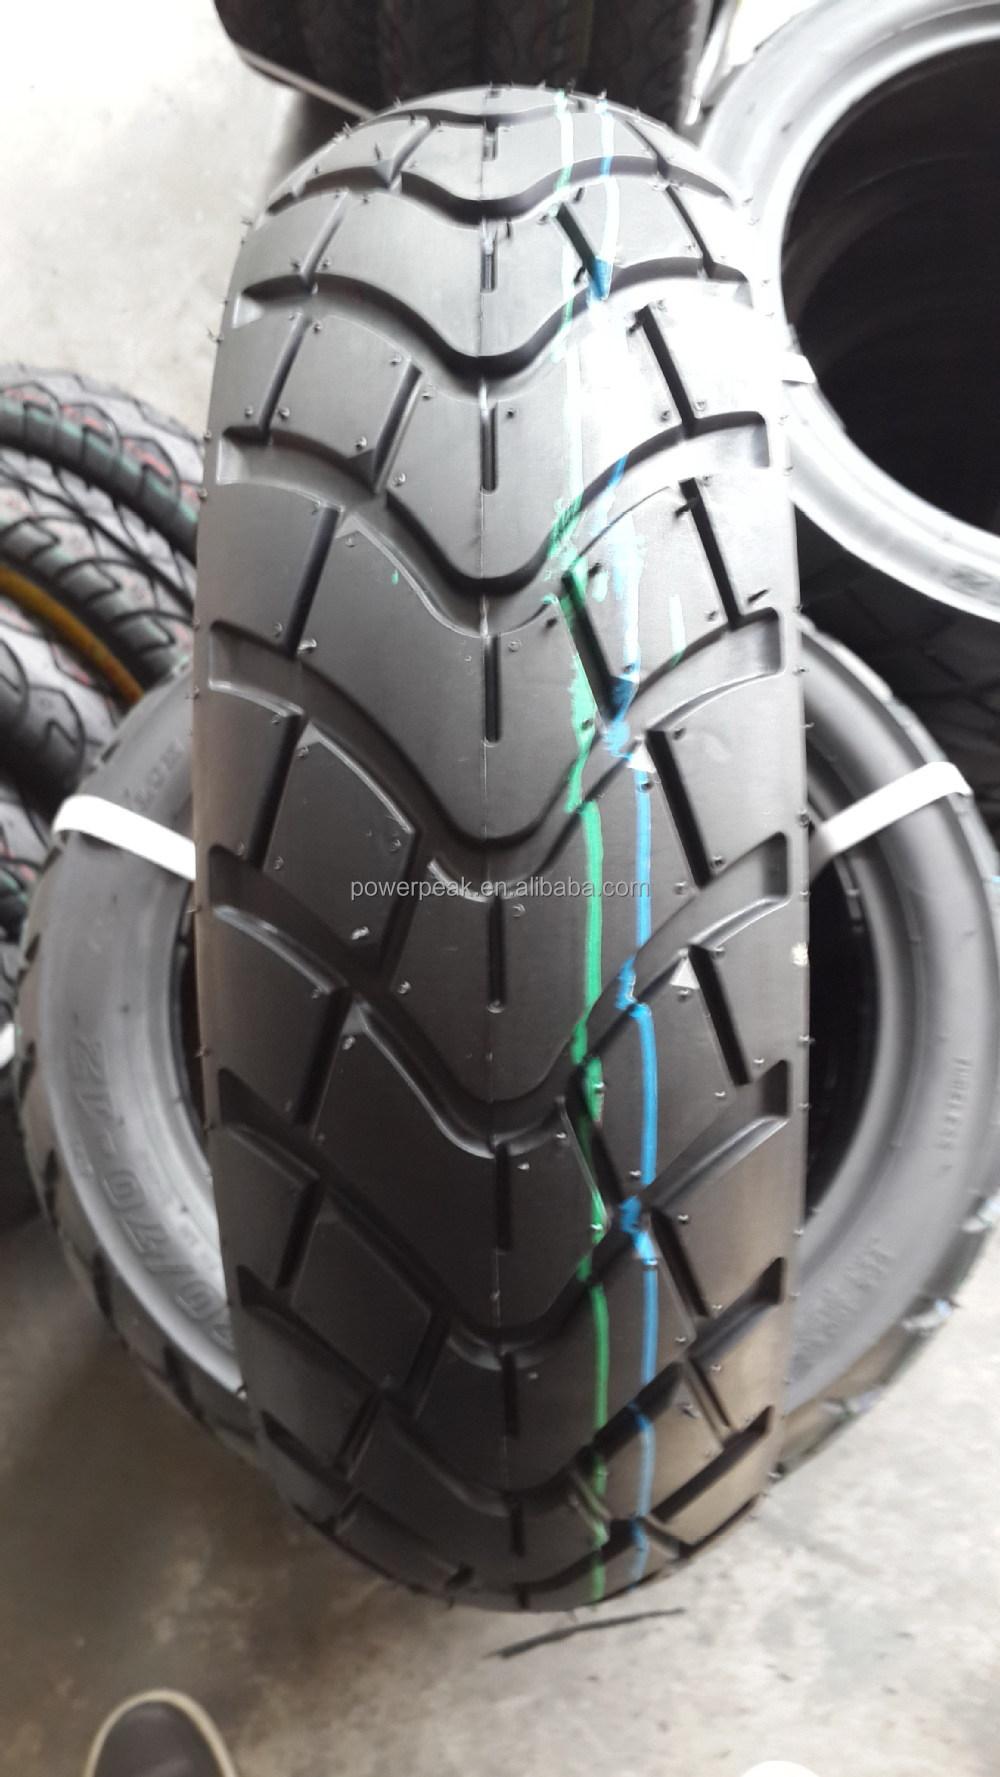 tubeless scooter tyre 120 70 12 tl 8pr cauchos 120 70 12. Black Bedroom Furniture Sets. Home Design Ideas